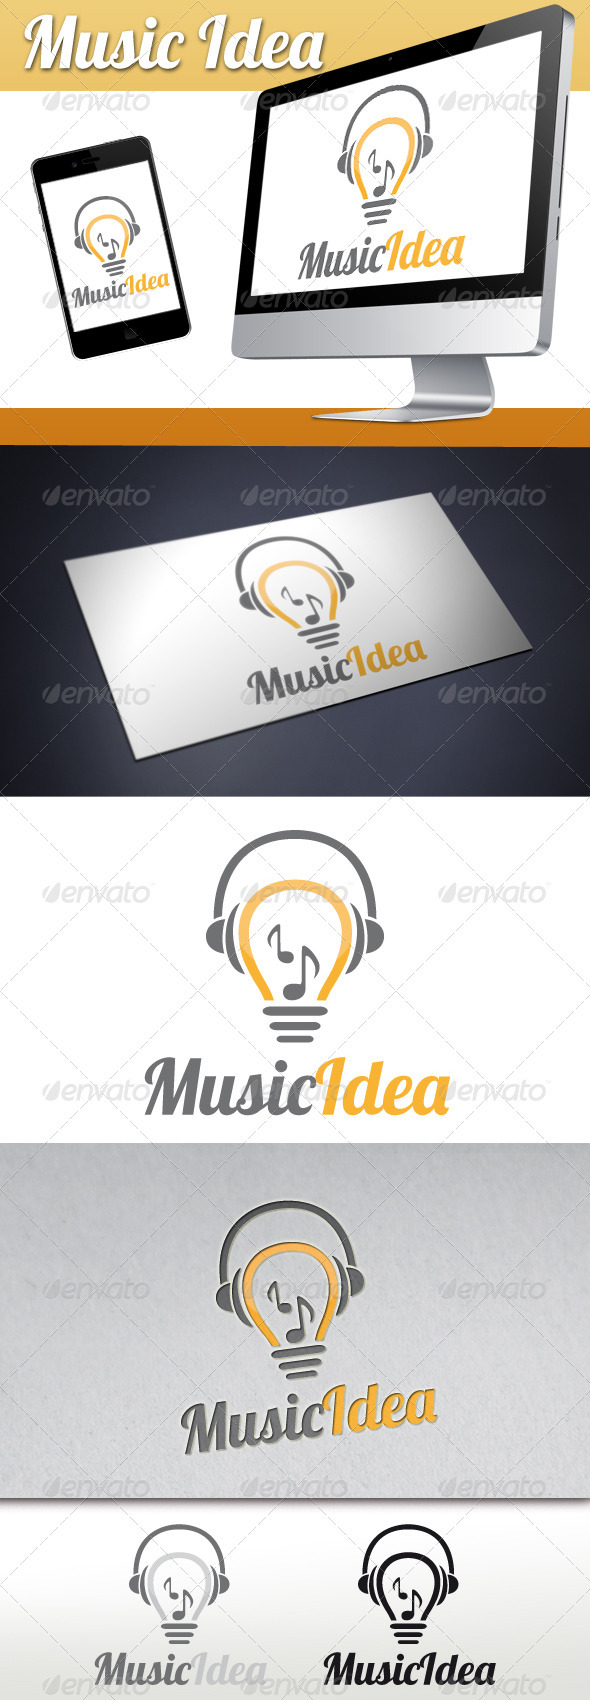 Music Idea Logo